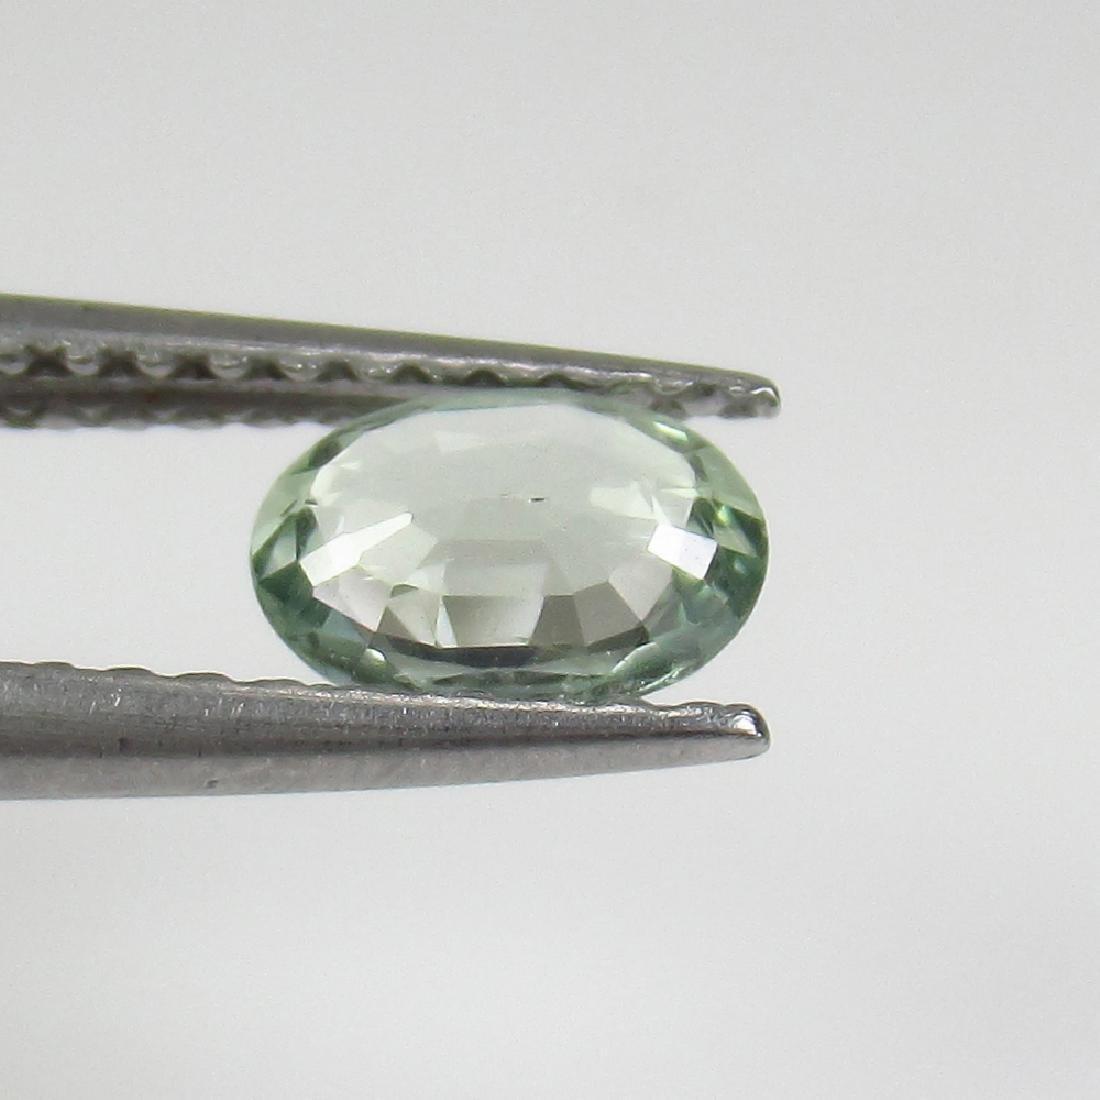 0.45 Ct Genuine Ceylon Green Sapphire Oval Cut - 2